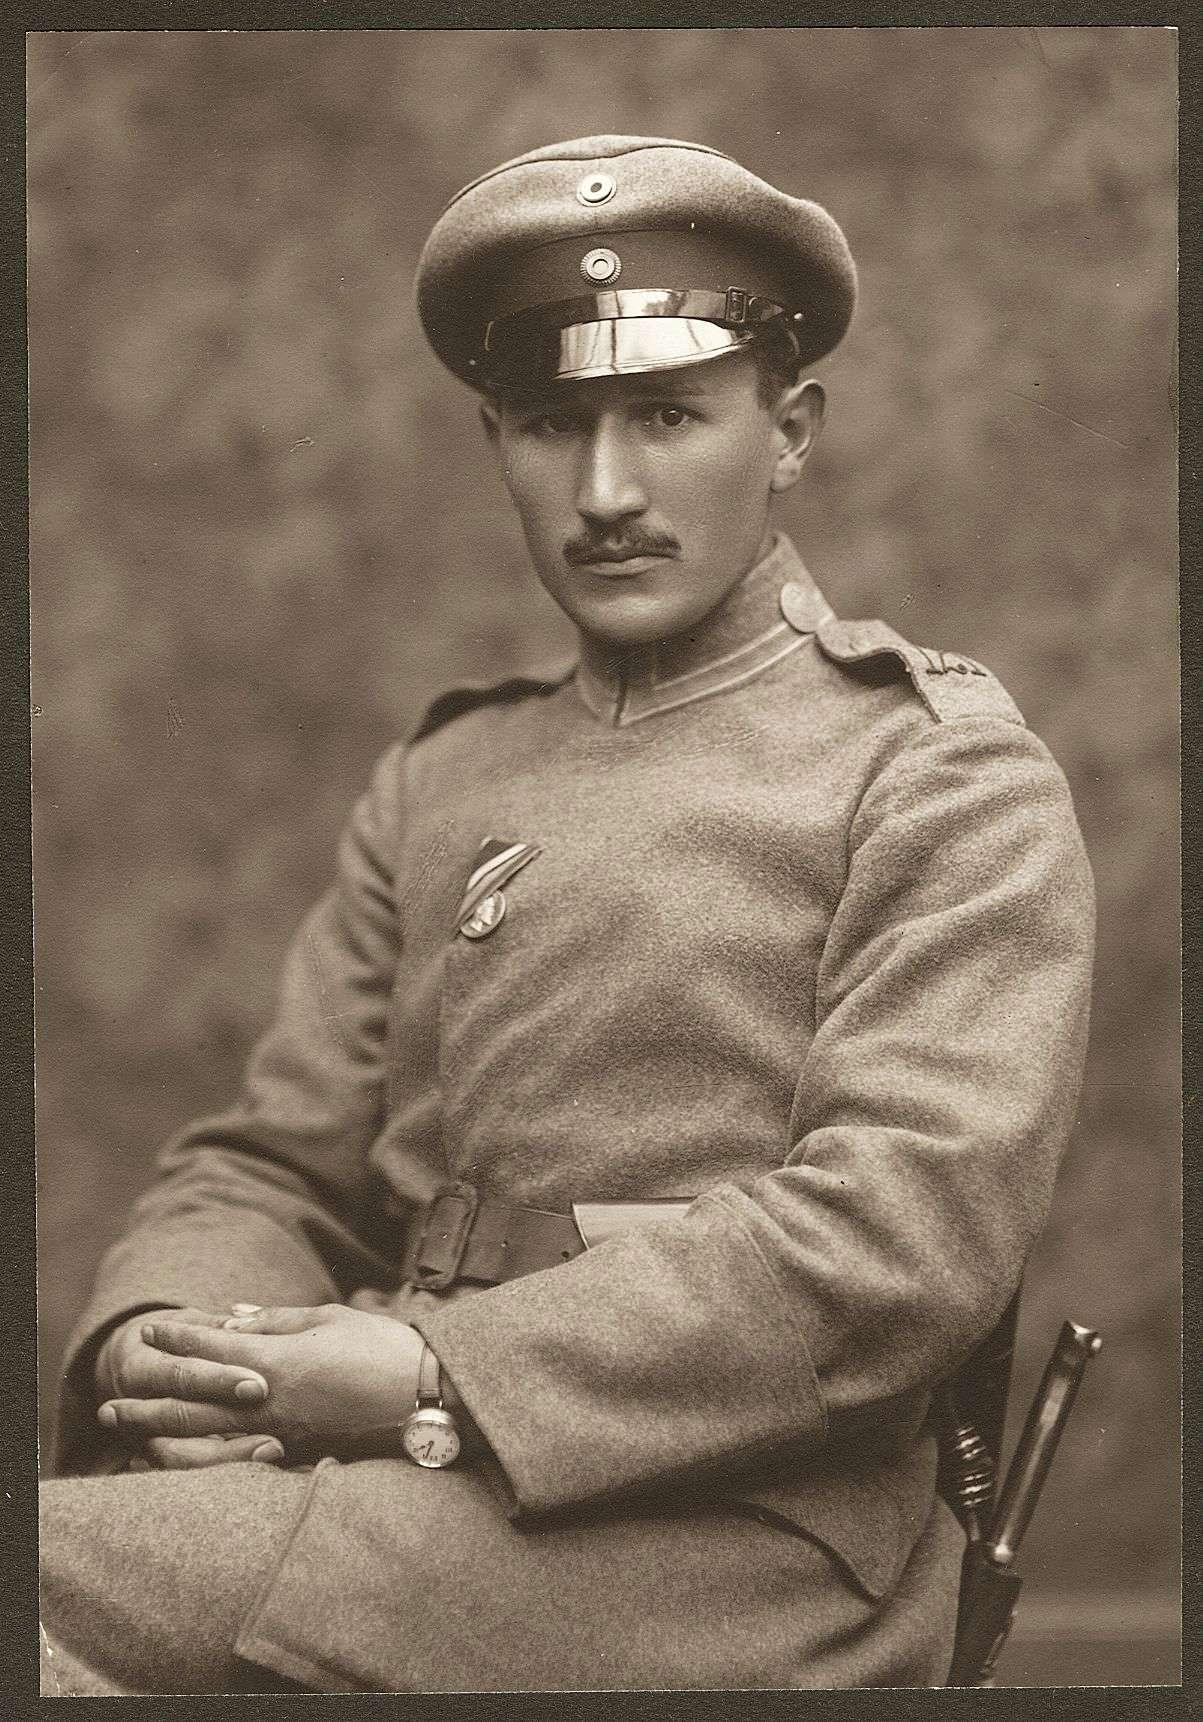 Maunz, Carl Friedrich, Bild 1